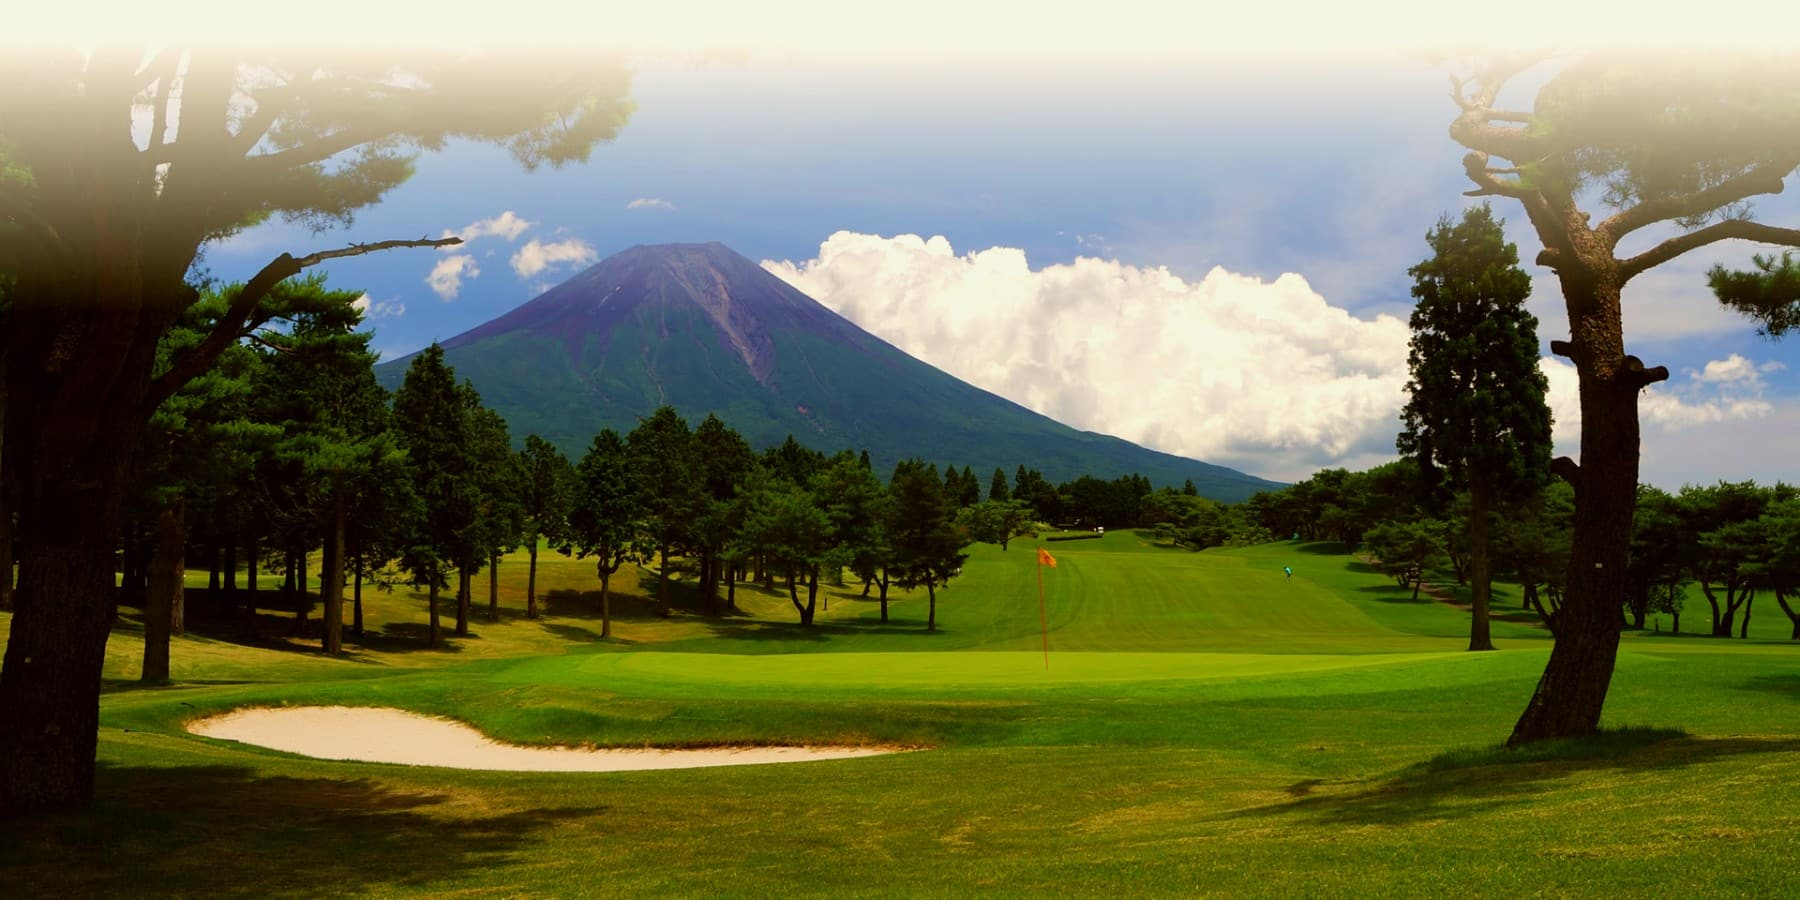 asagiri-golf-club-016